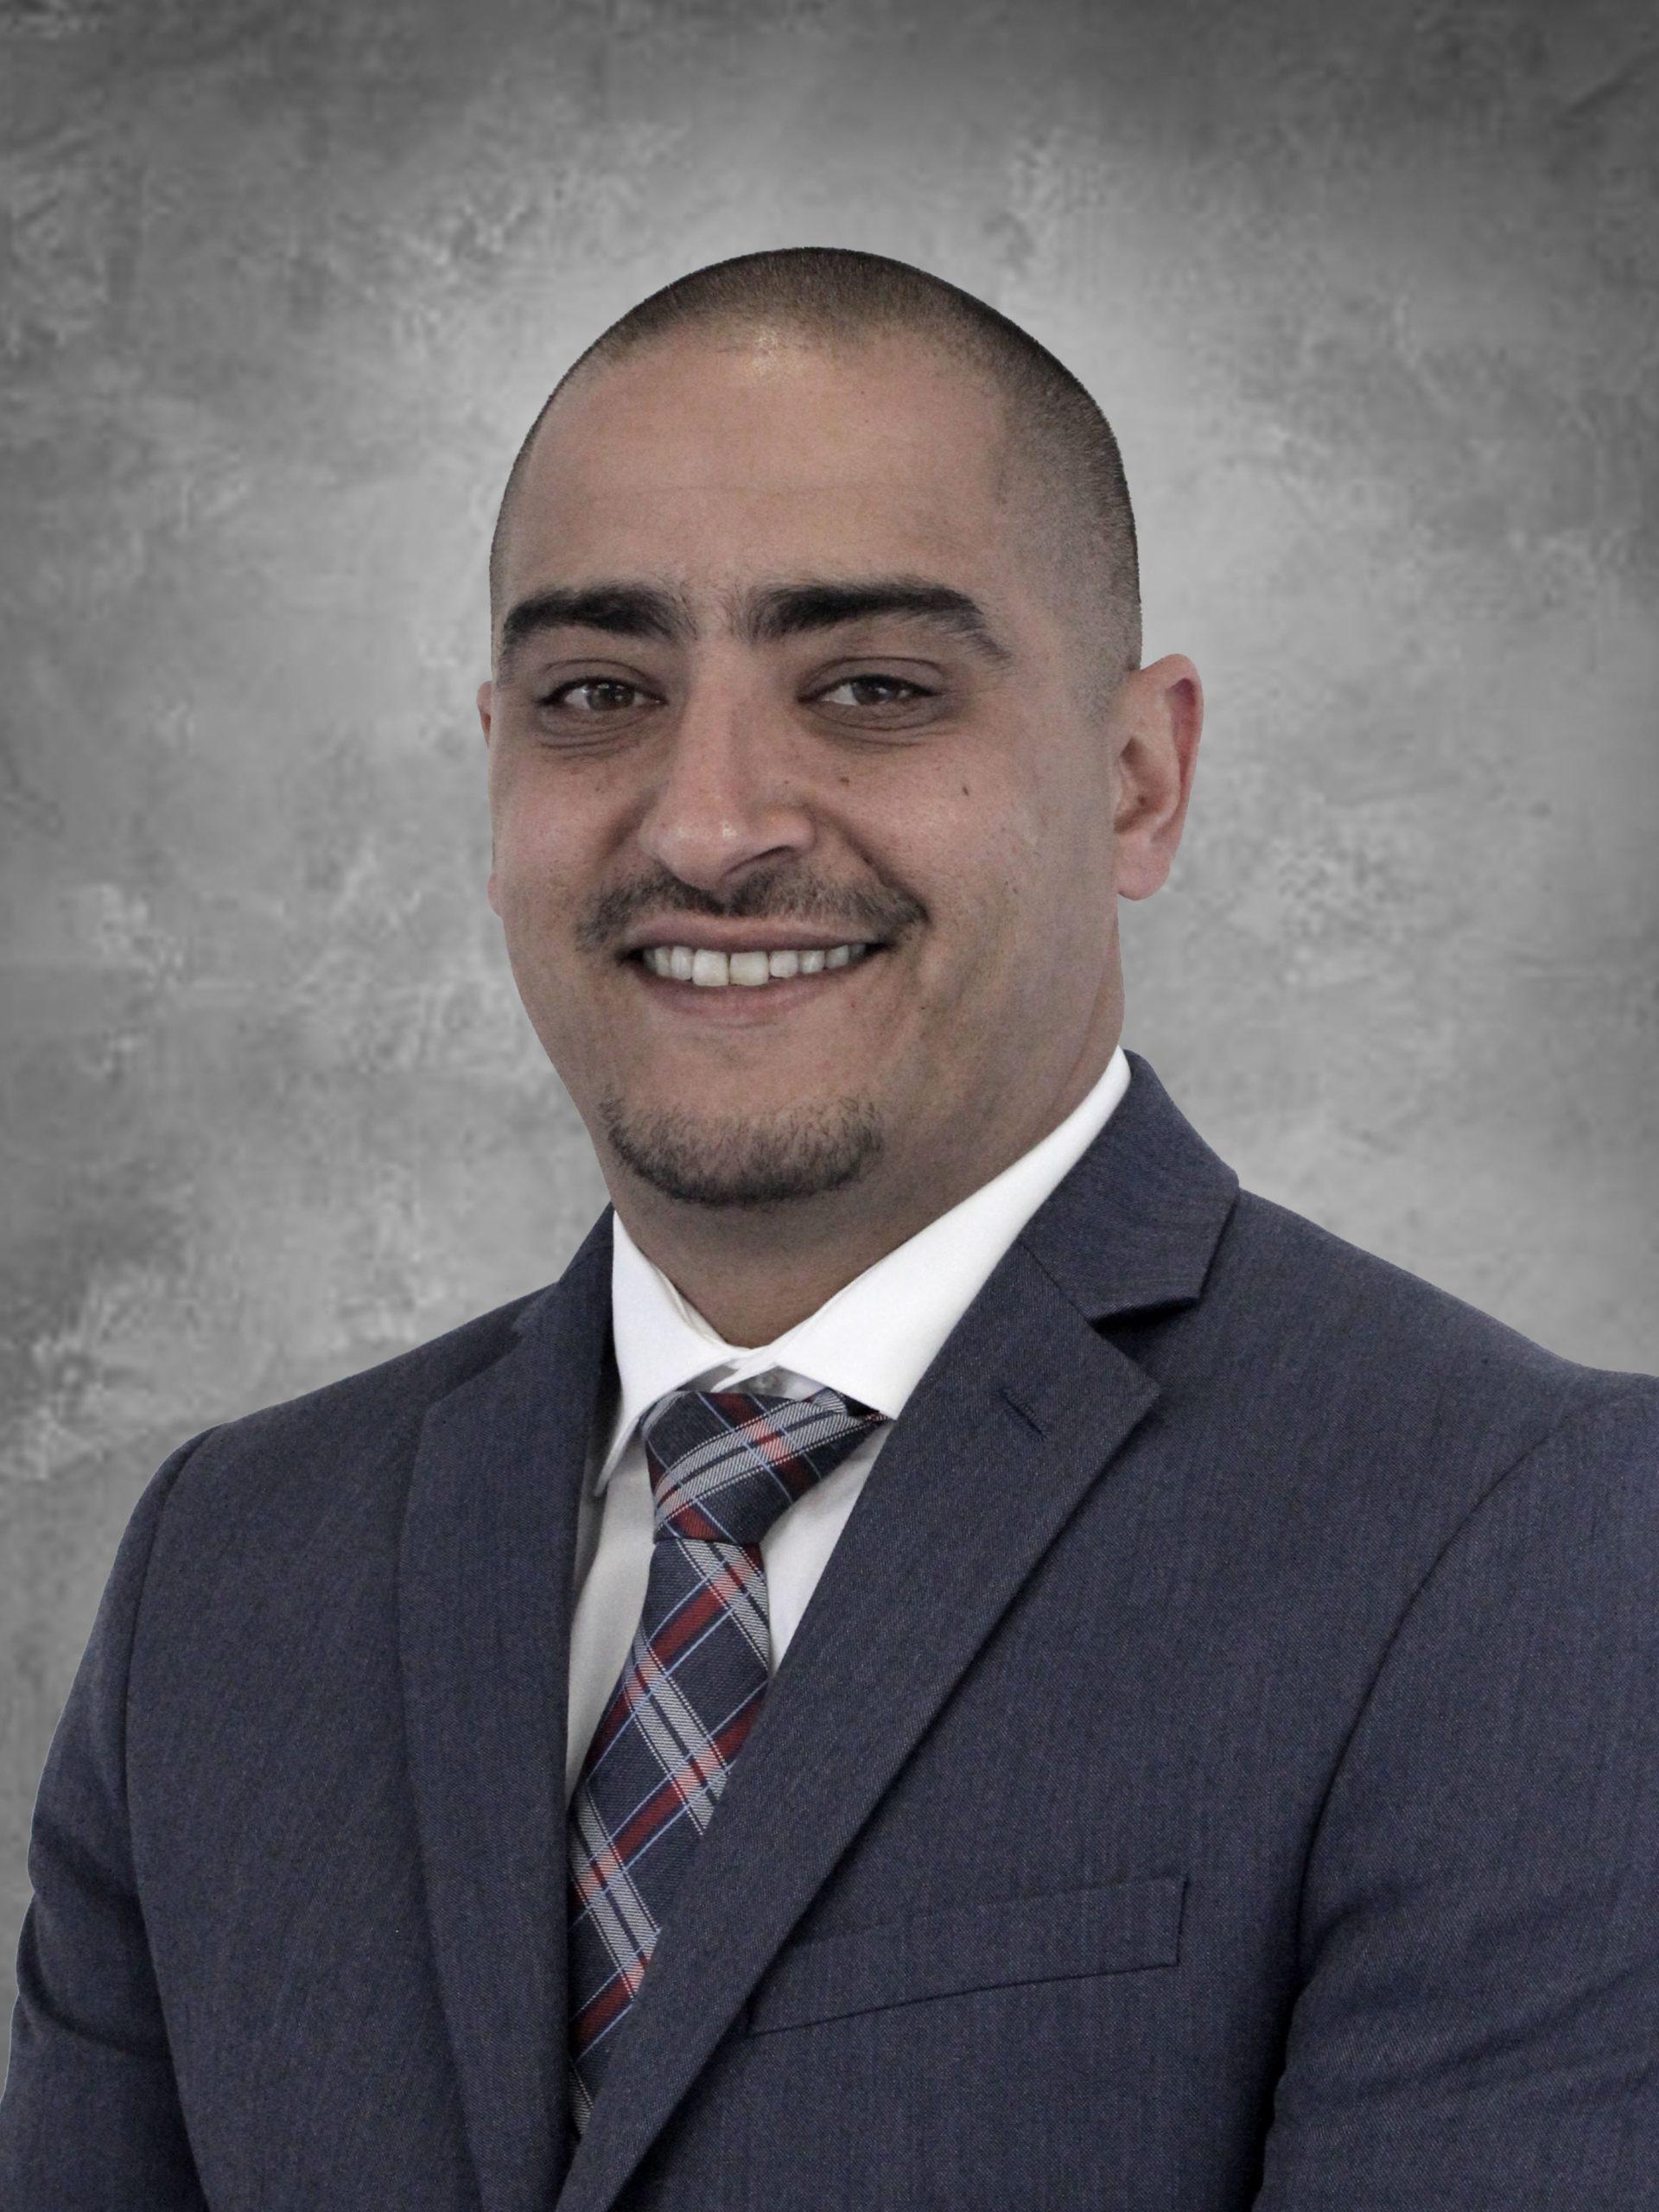 Aiman Saleh